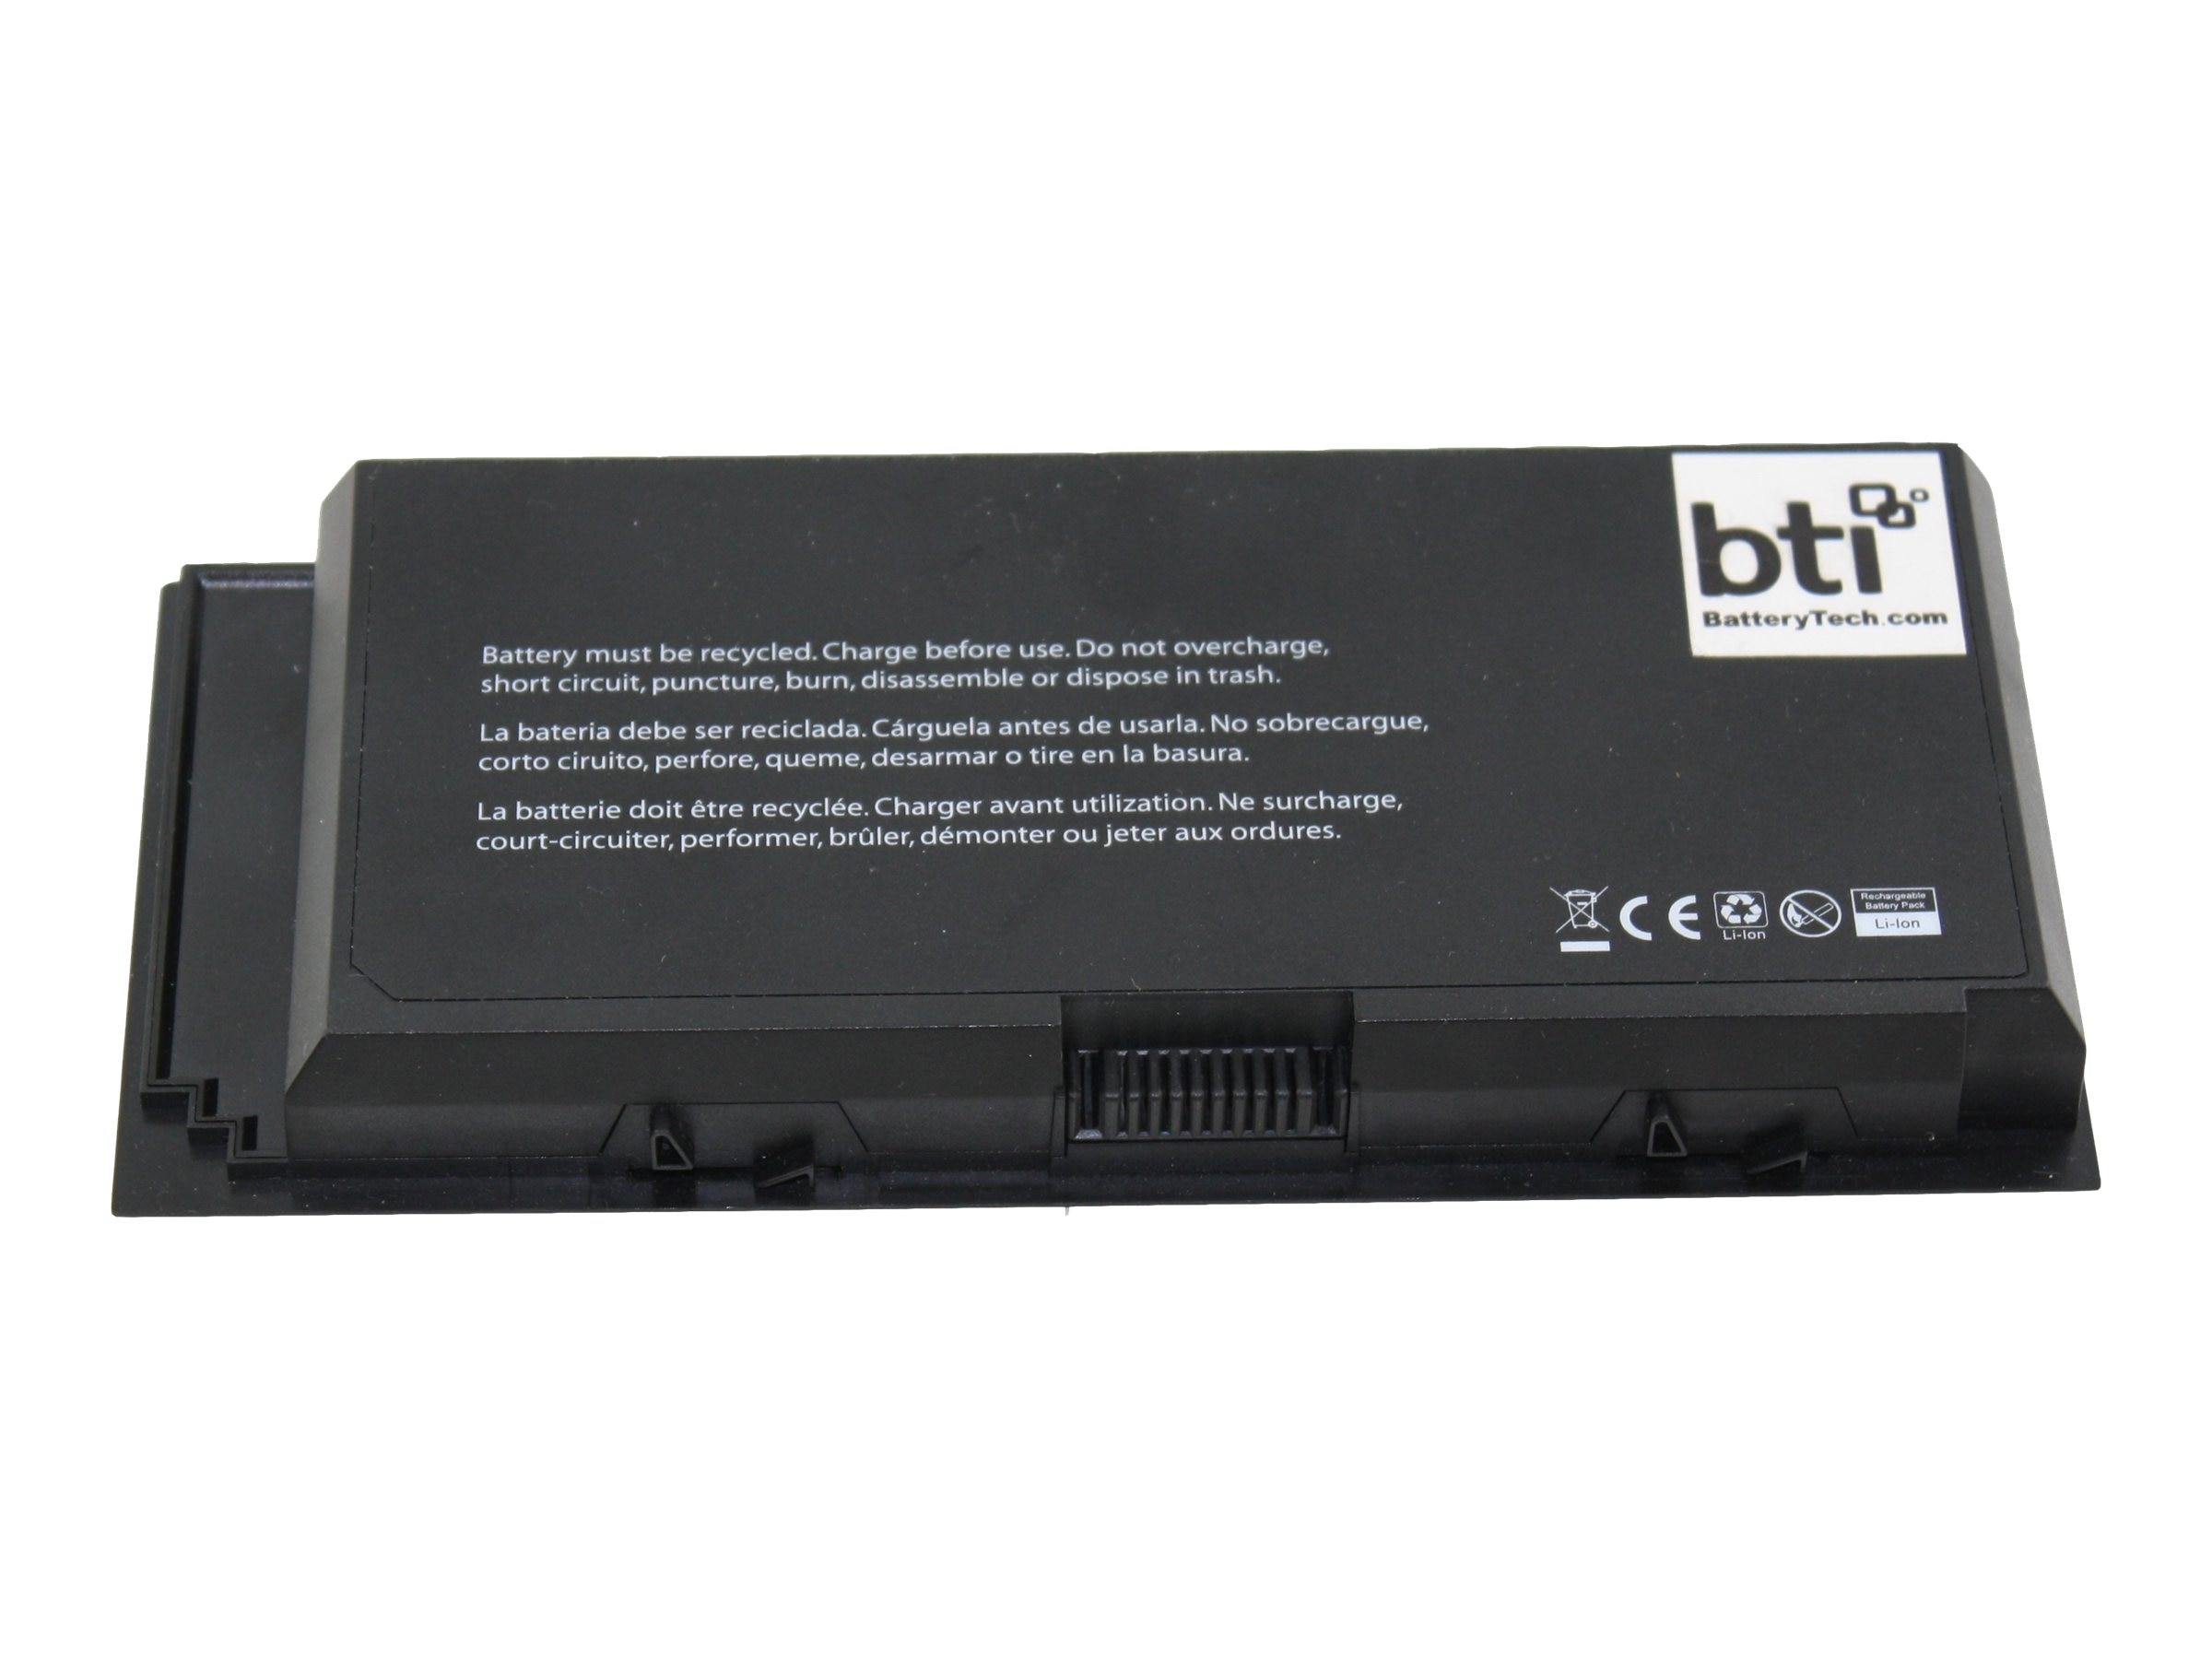 Bti Batt Dell Precision M4600 Batt312 1177 312 1178 0rtkdh Dl M4600x6 Short Circuit No Disassemble